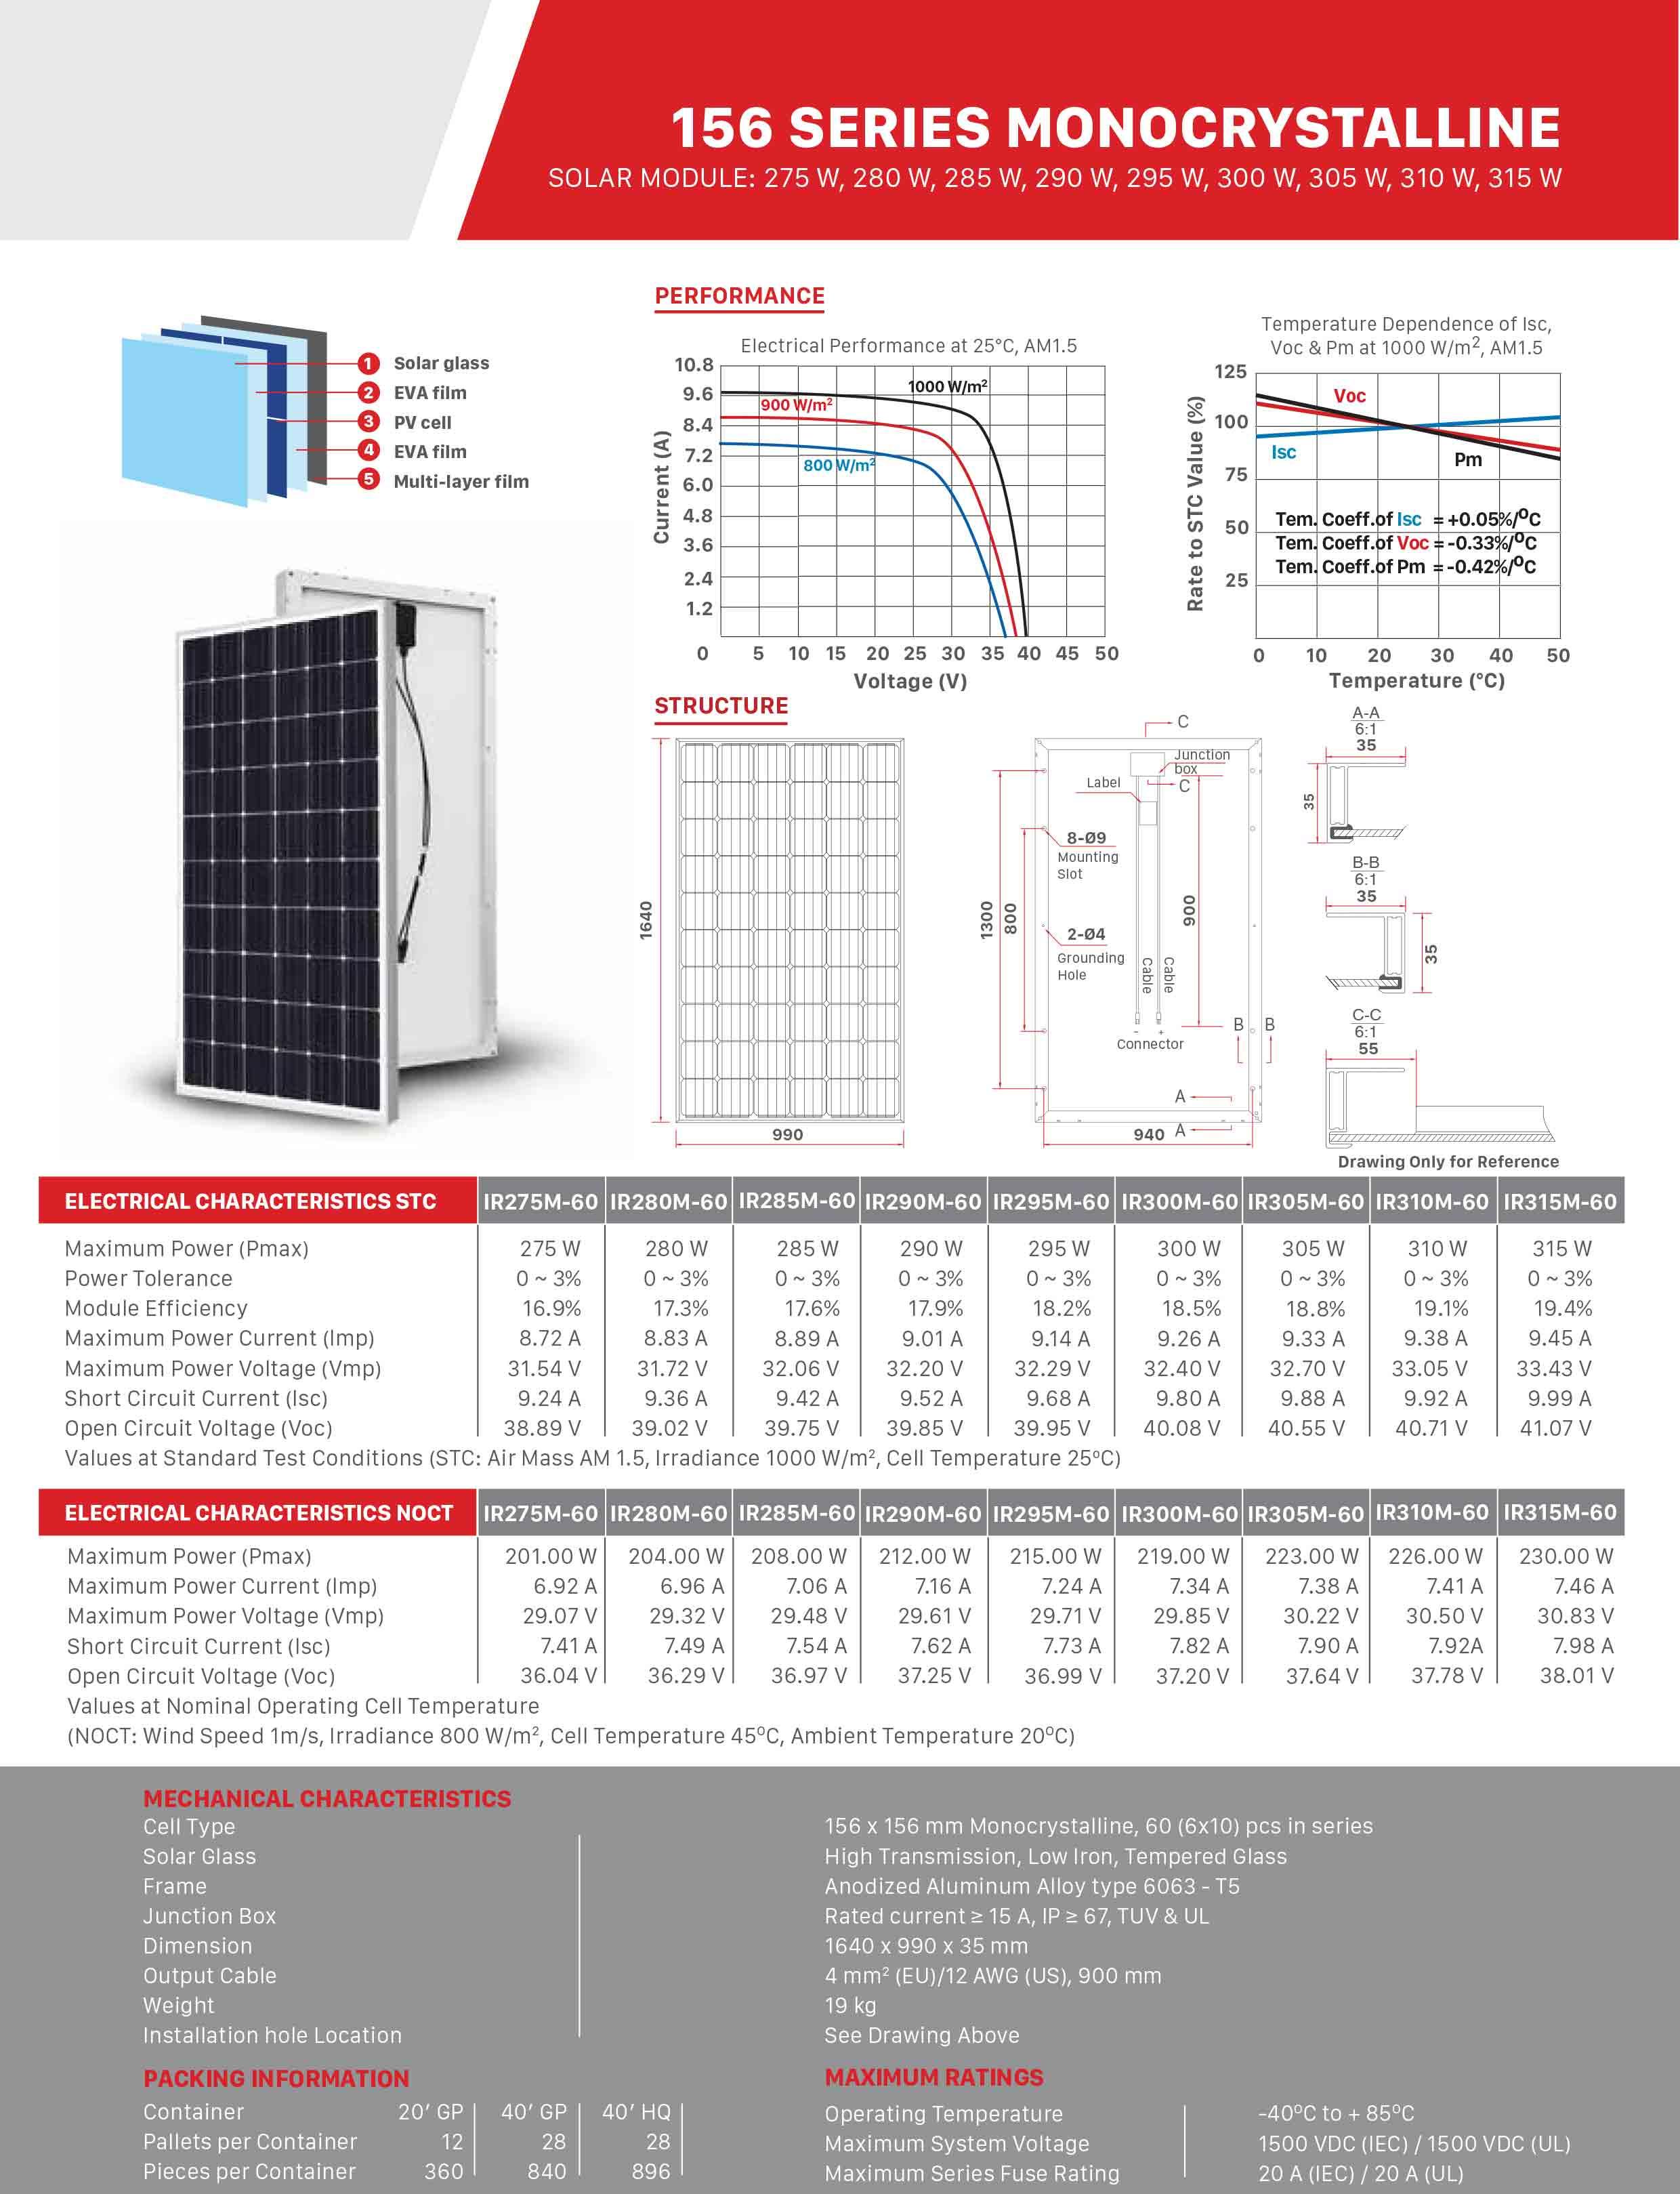 sản phẩm tấm pin năng lượng mặt trời irex mono 275w - 315w